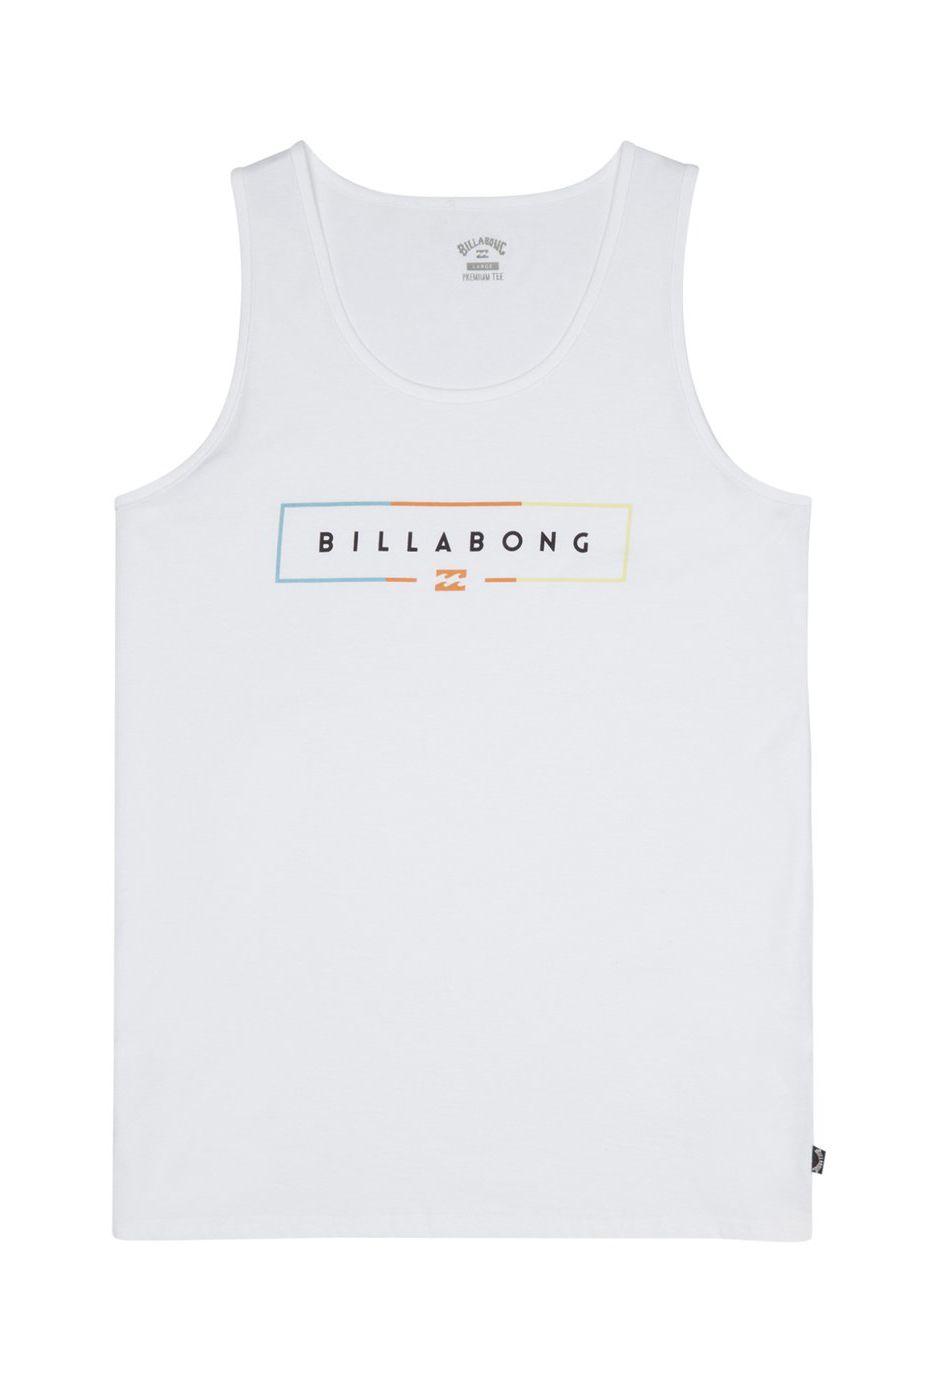 Billabong T-Shirt Tank Top UNITY White